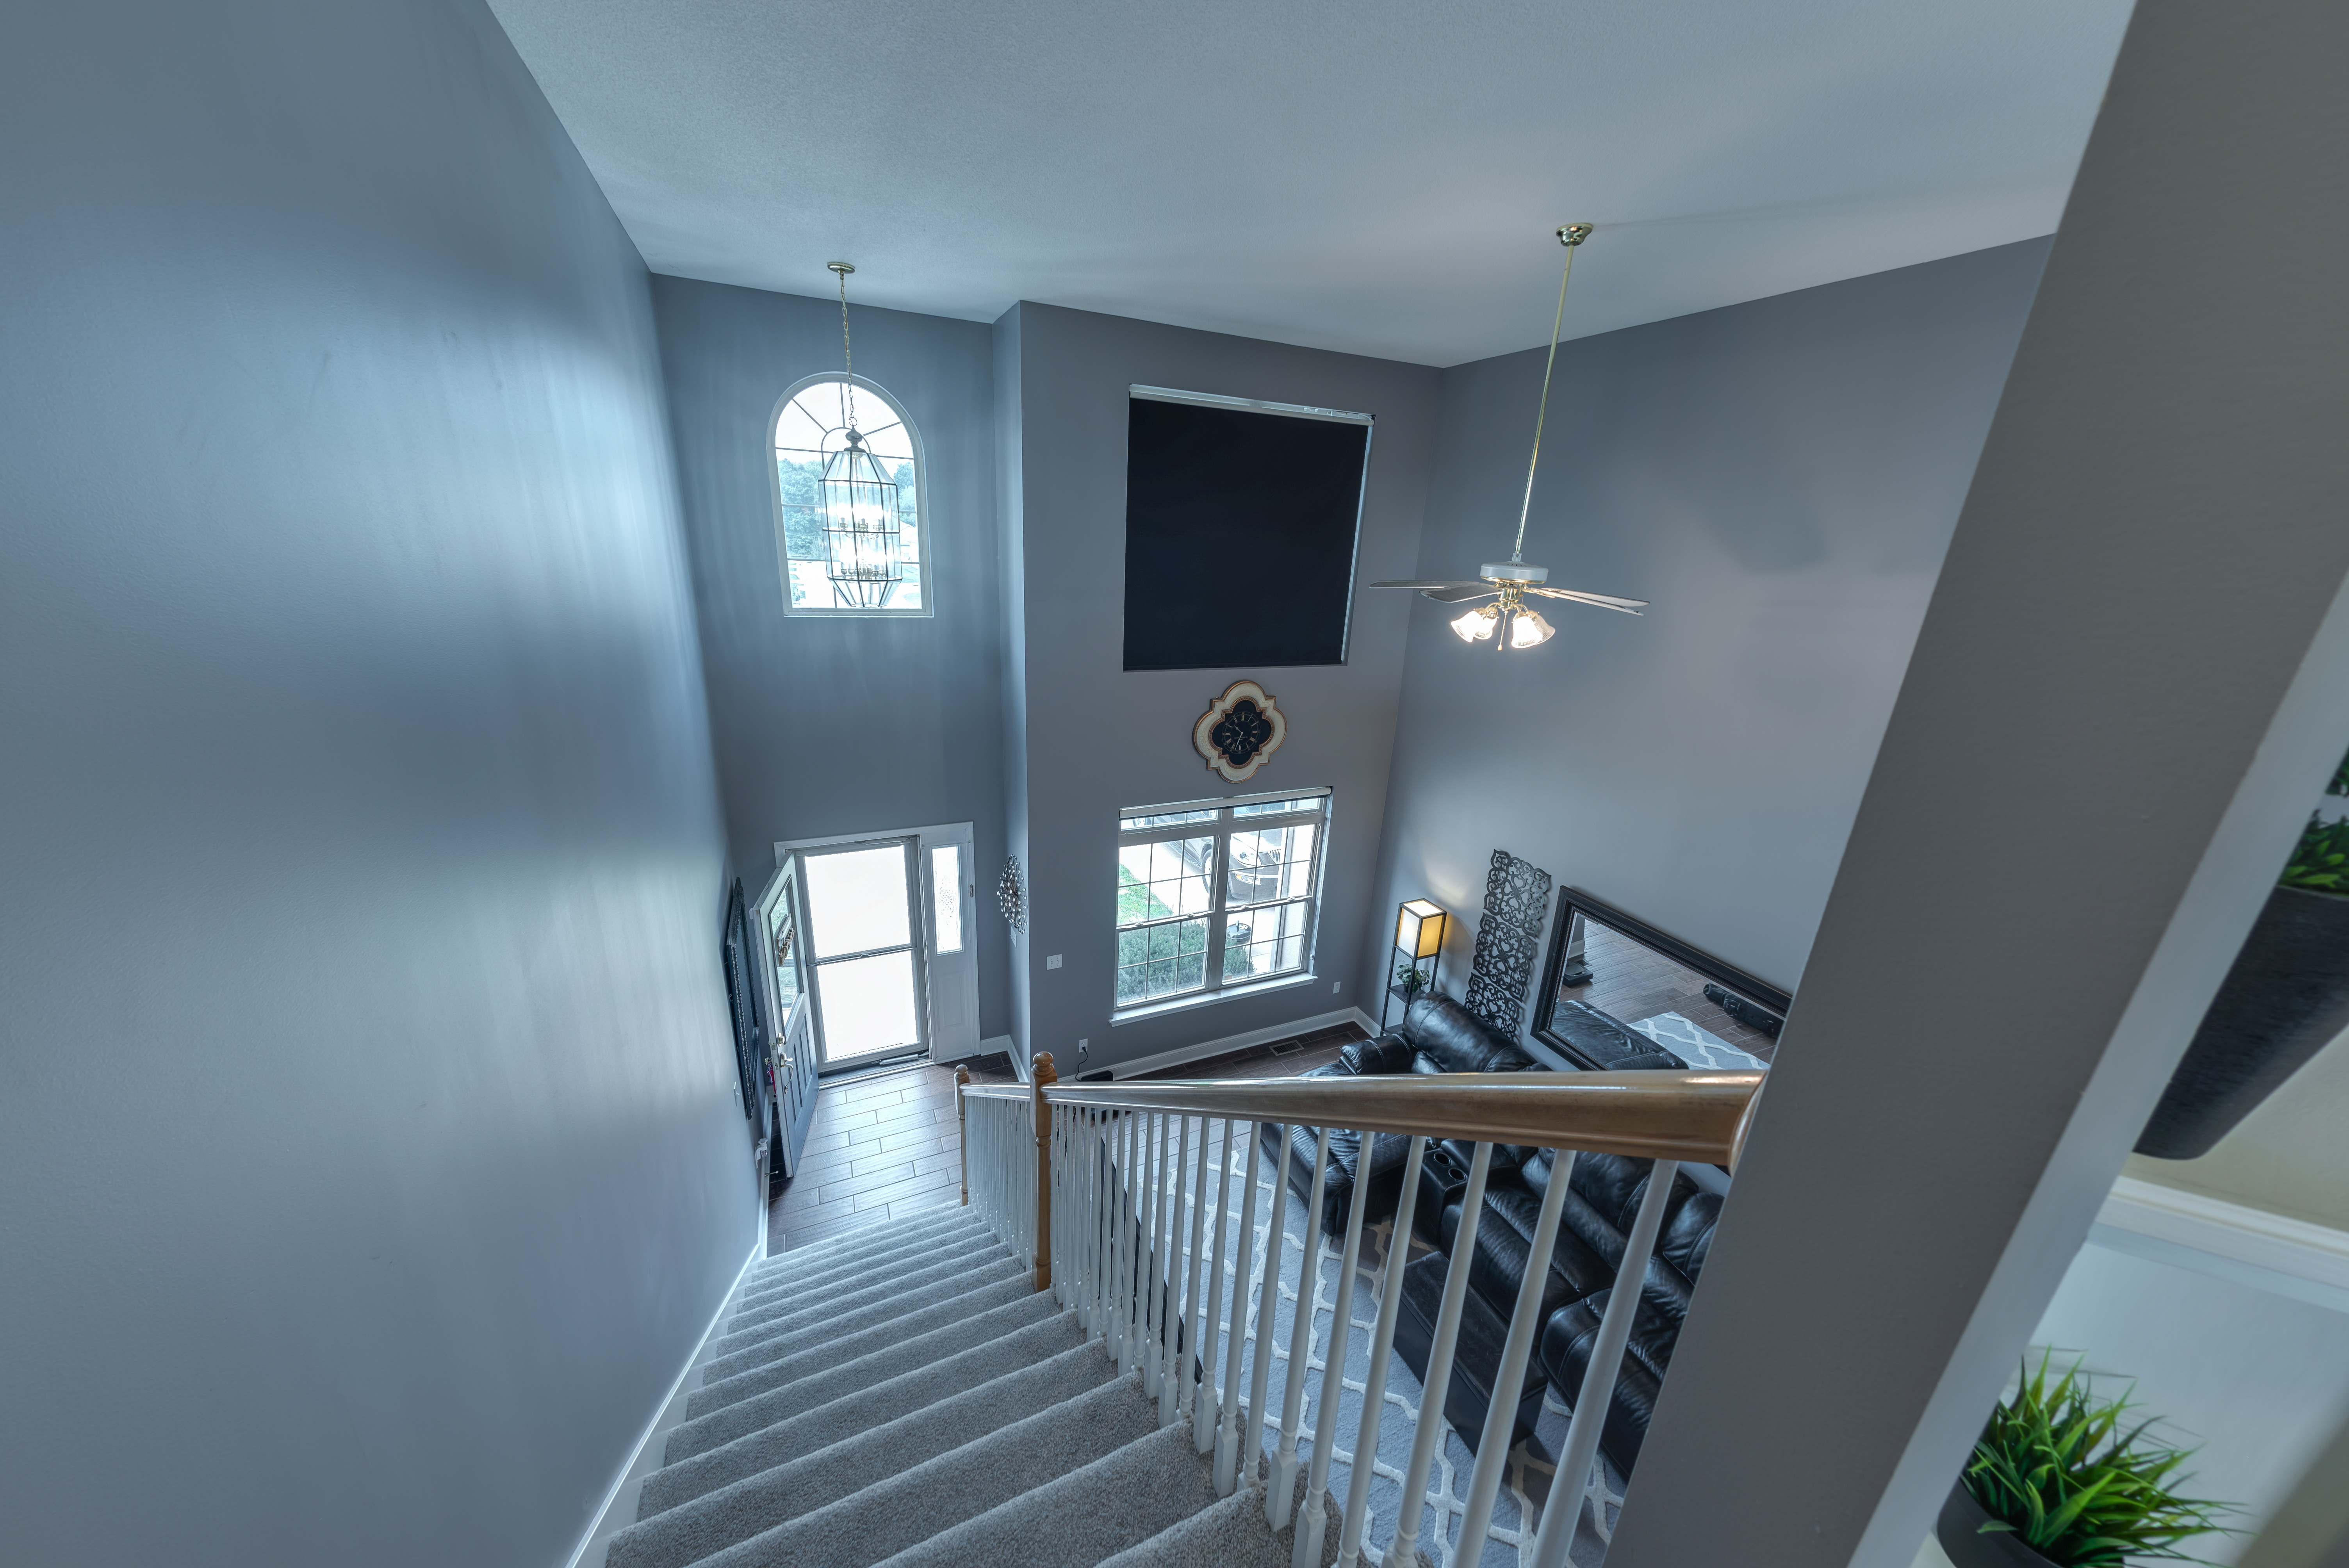 1320 Fawn Ln, Warrensburg, MO 64093 | RealEstate.com